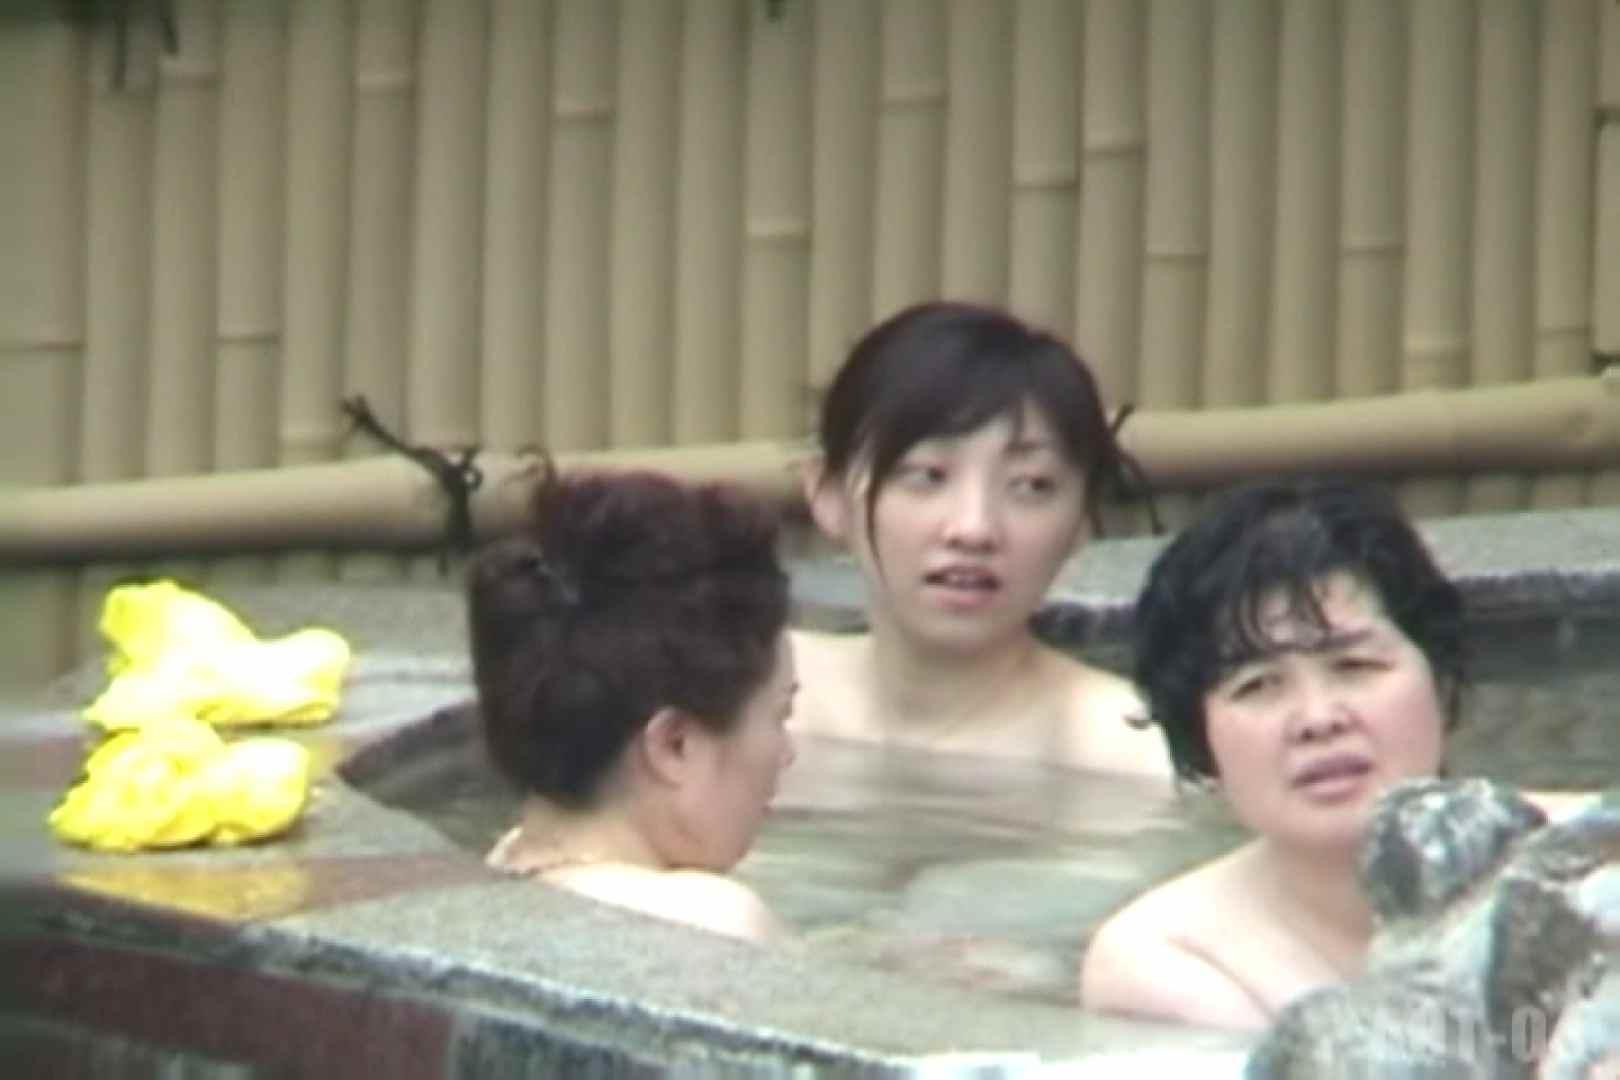 Aquaな露天風呂Vol.743 盗撮映像  75Pix 22